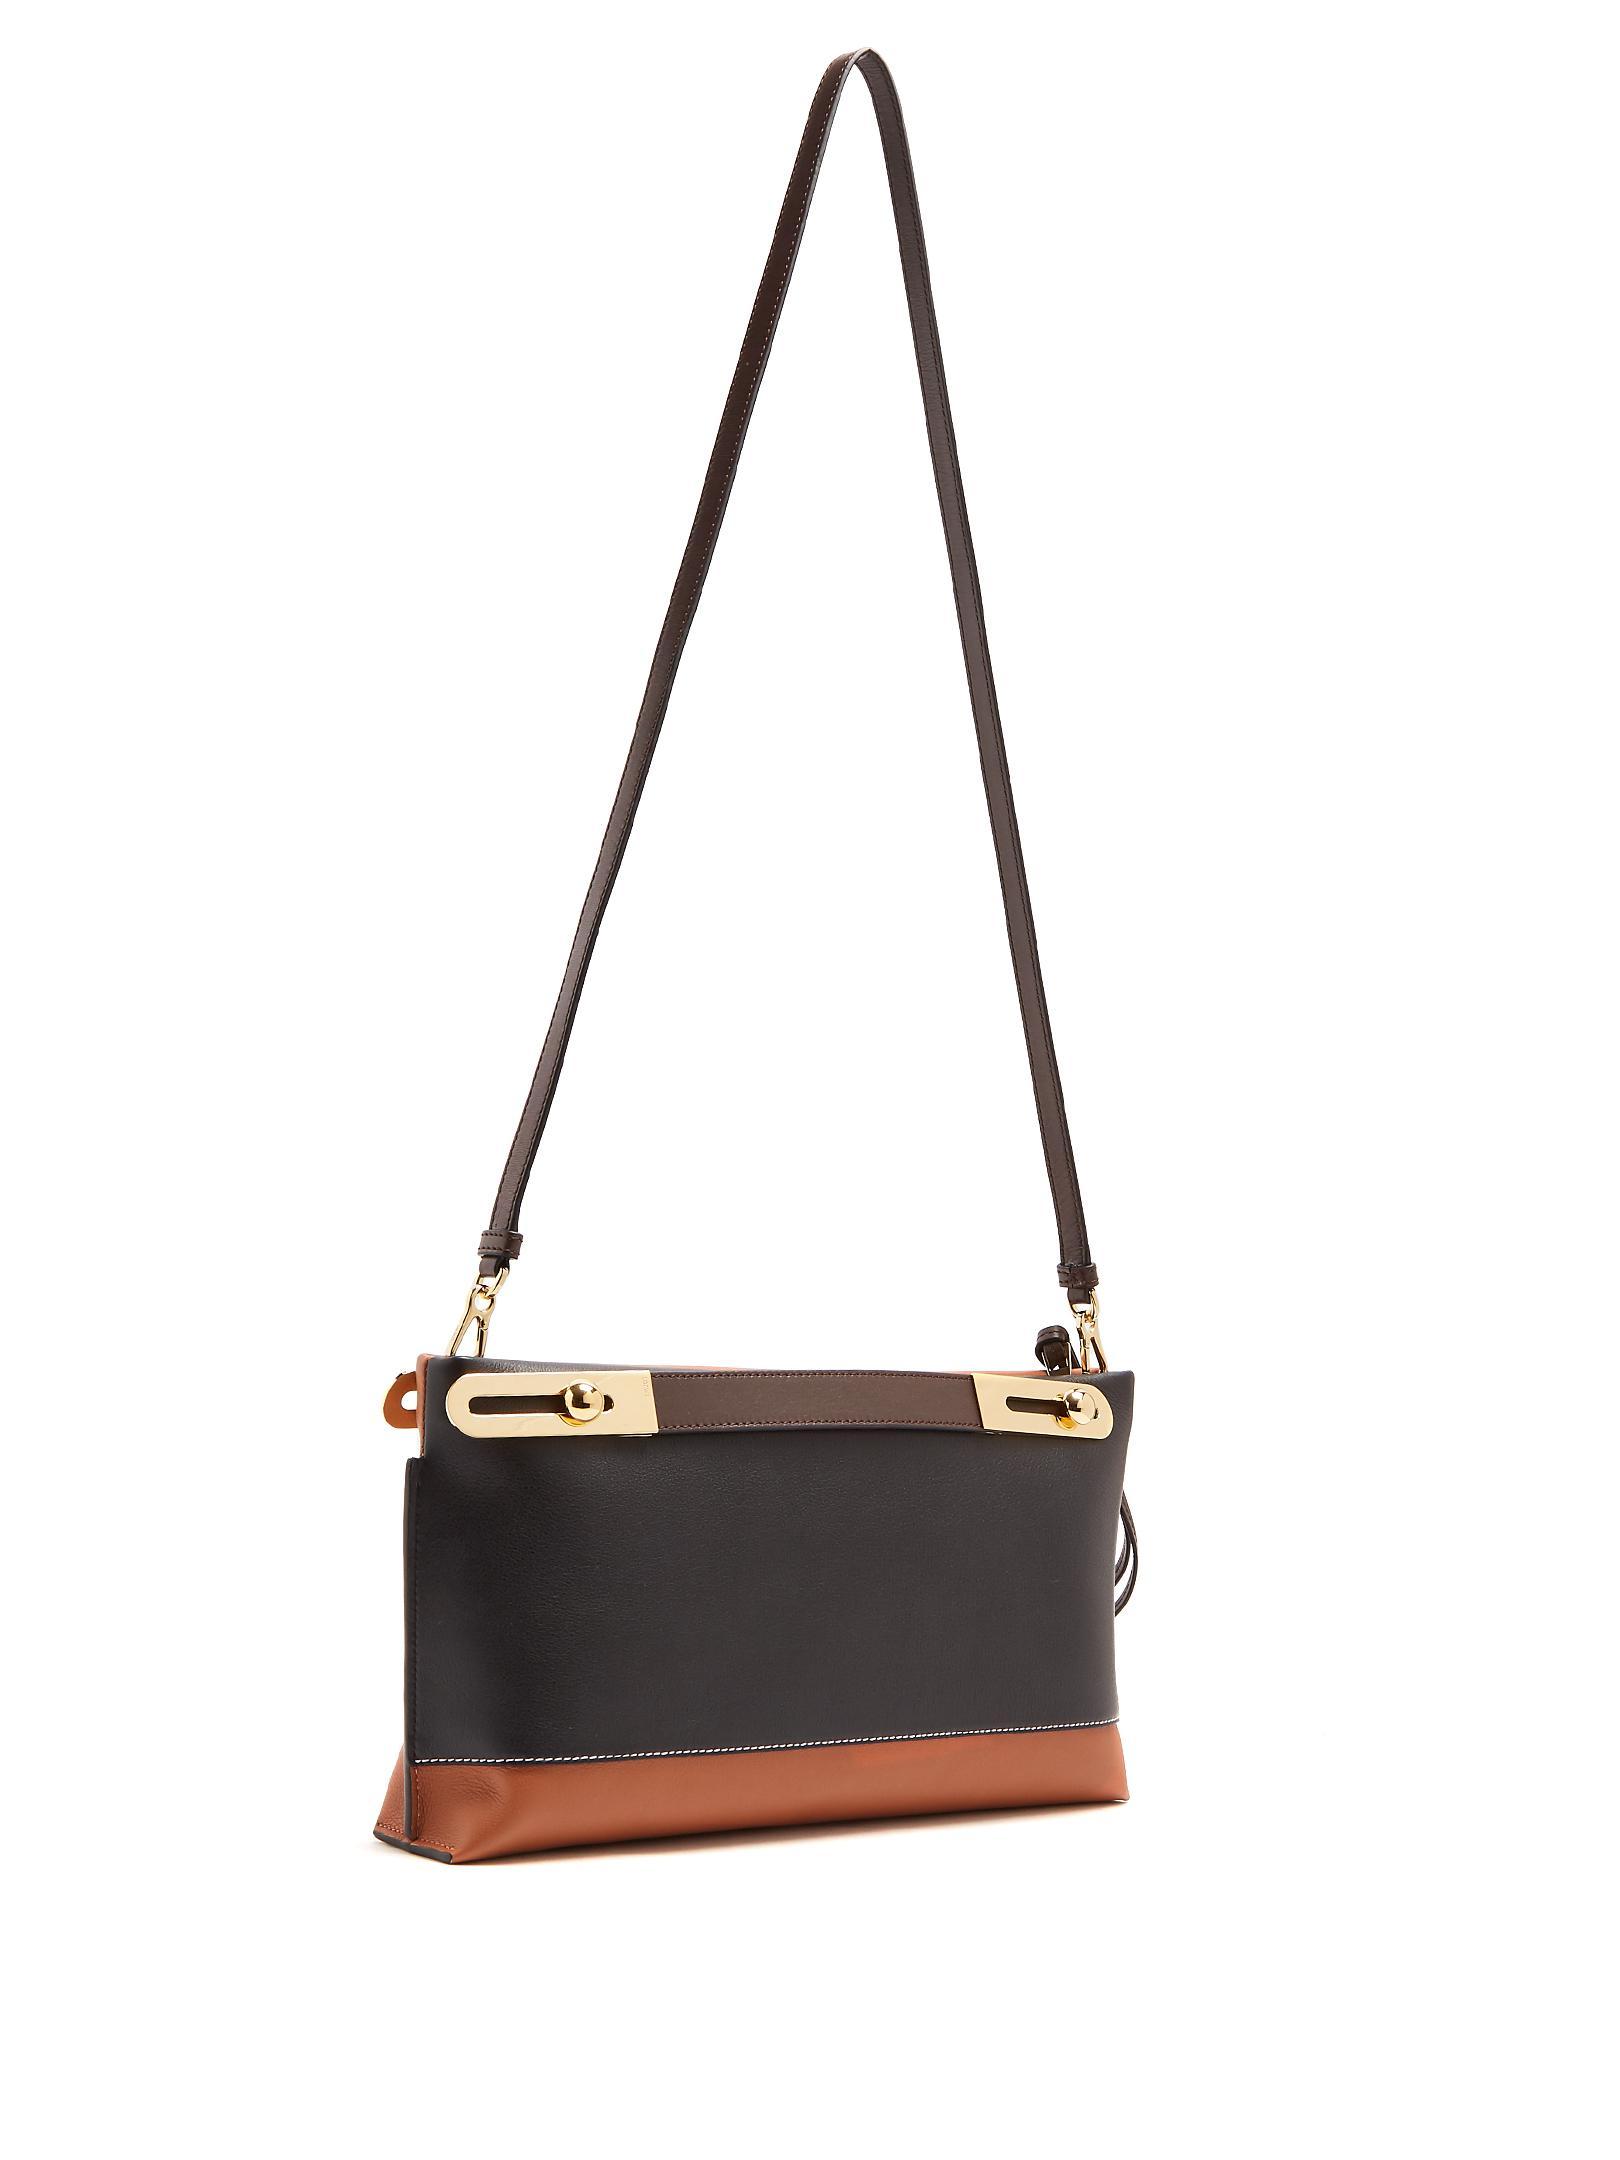 Loewe Missy Polka Dot Leather Bag XryGu